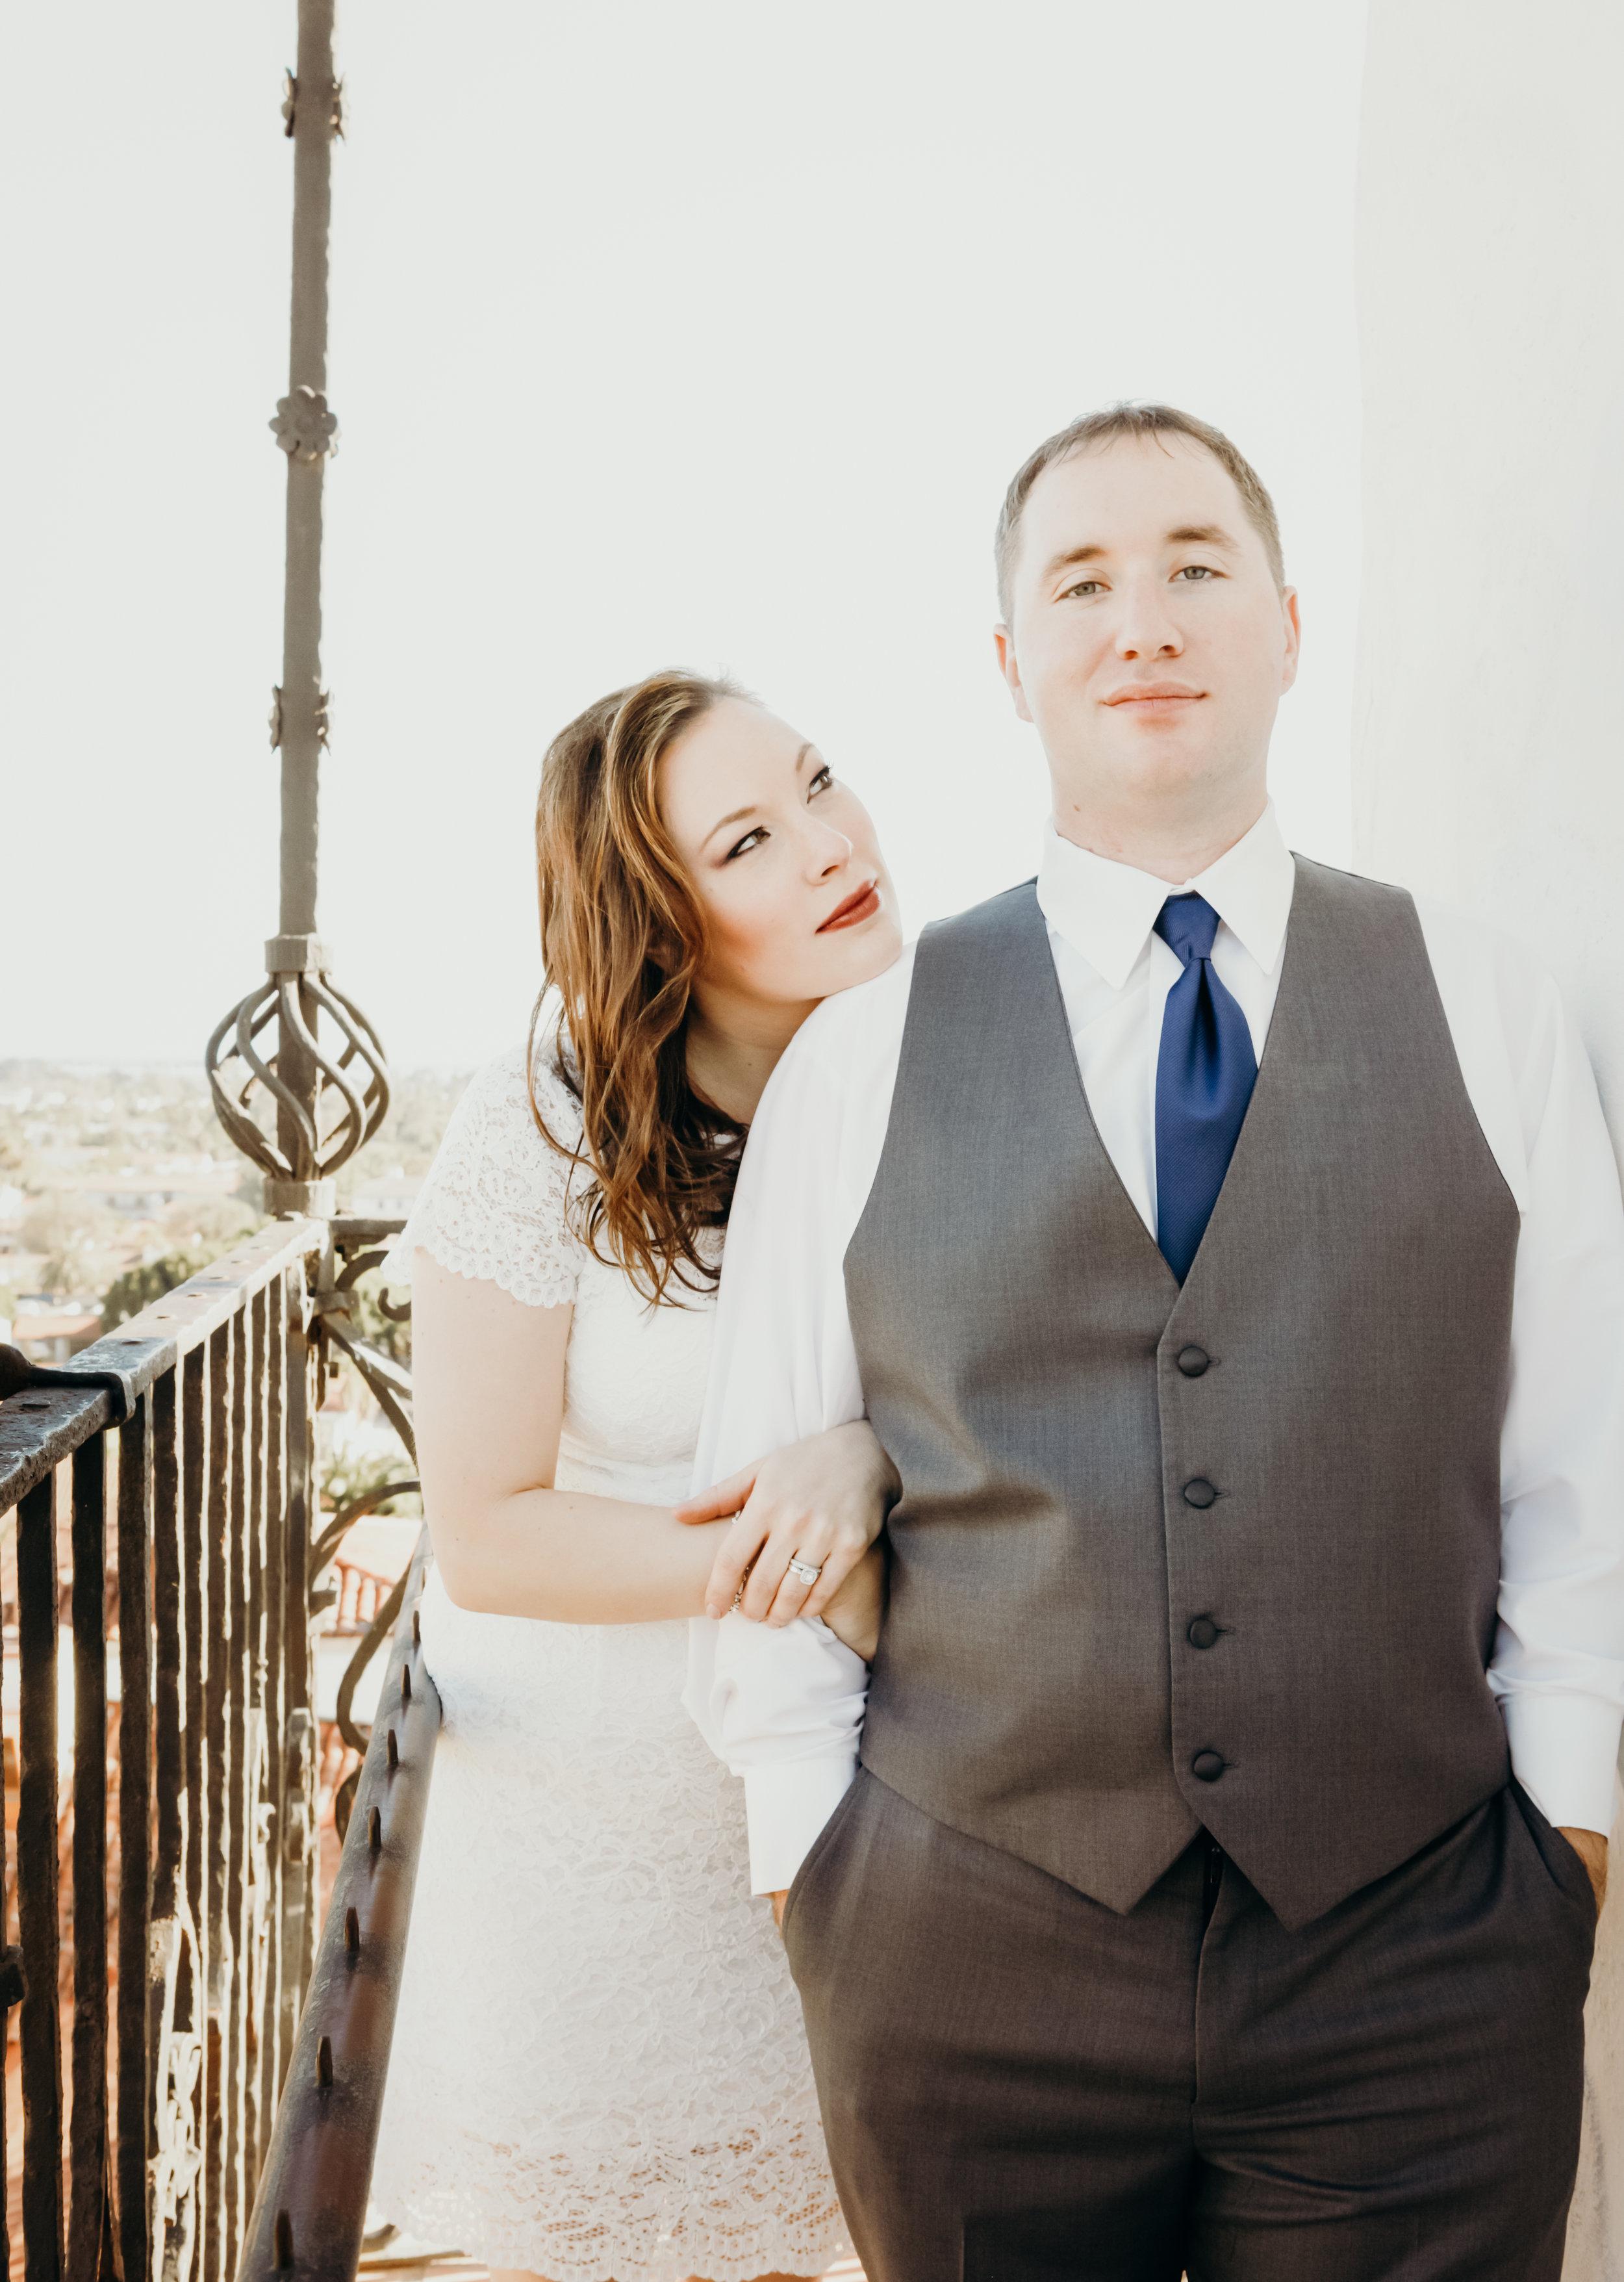 Gianna Keiko Atlanta Destination Wedding Elopement Photographer-34.jpg